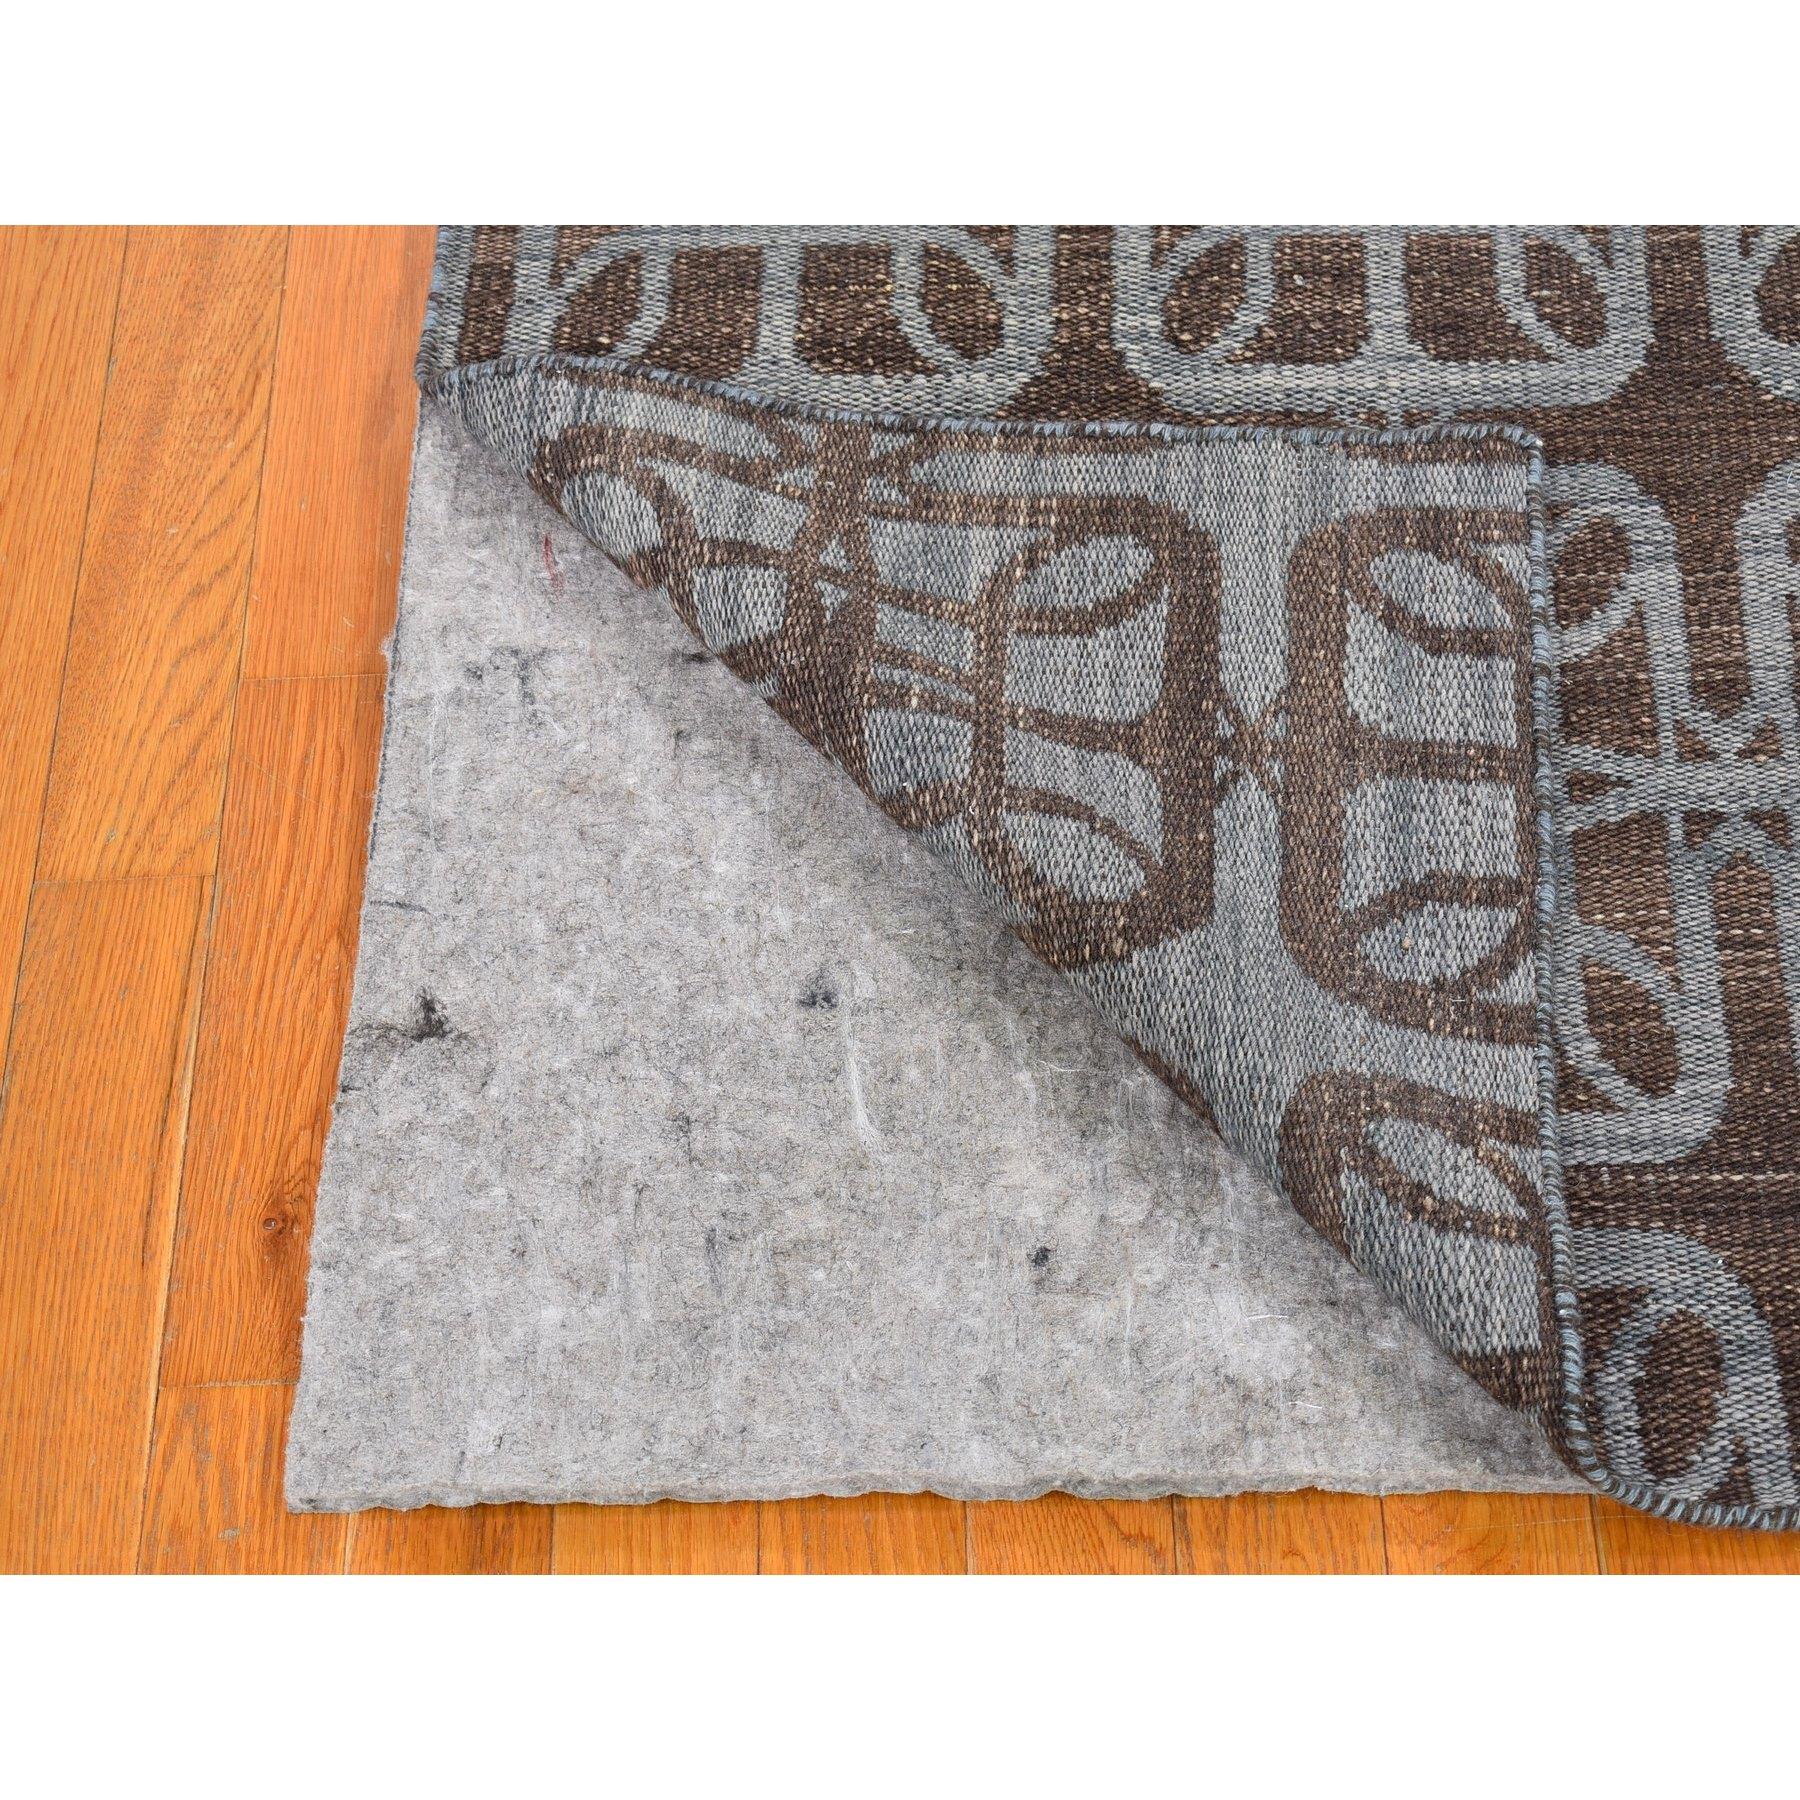 4'x6' Brown Hand Woven Flat Weave Pure Wool Reversible Kilim Oriental Rug